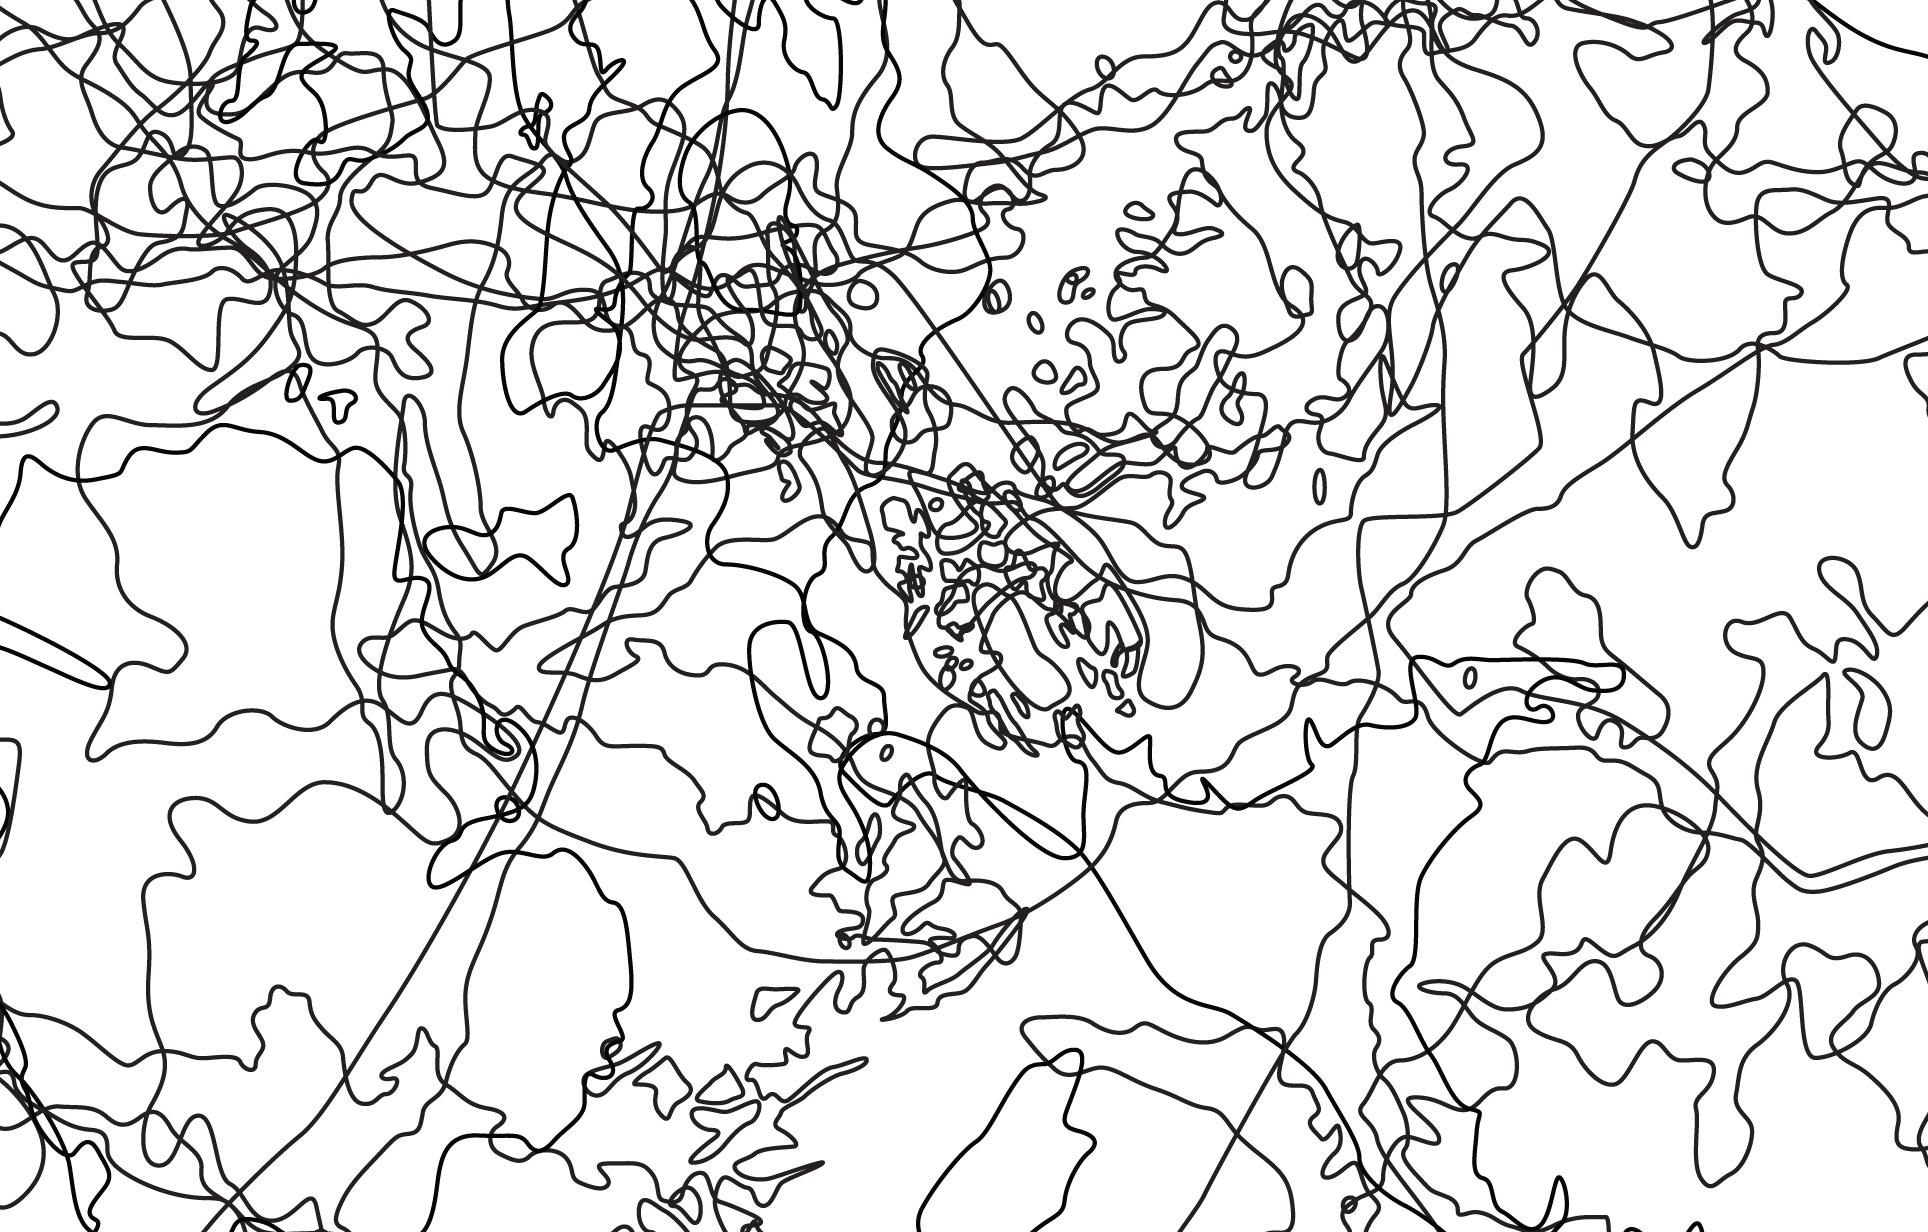 """Topography: Intergovernmental Organization: North Atlantic Treaty Organization"" detail"